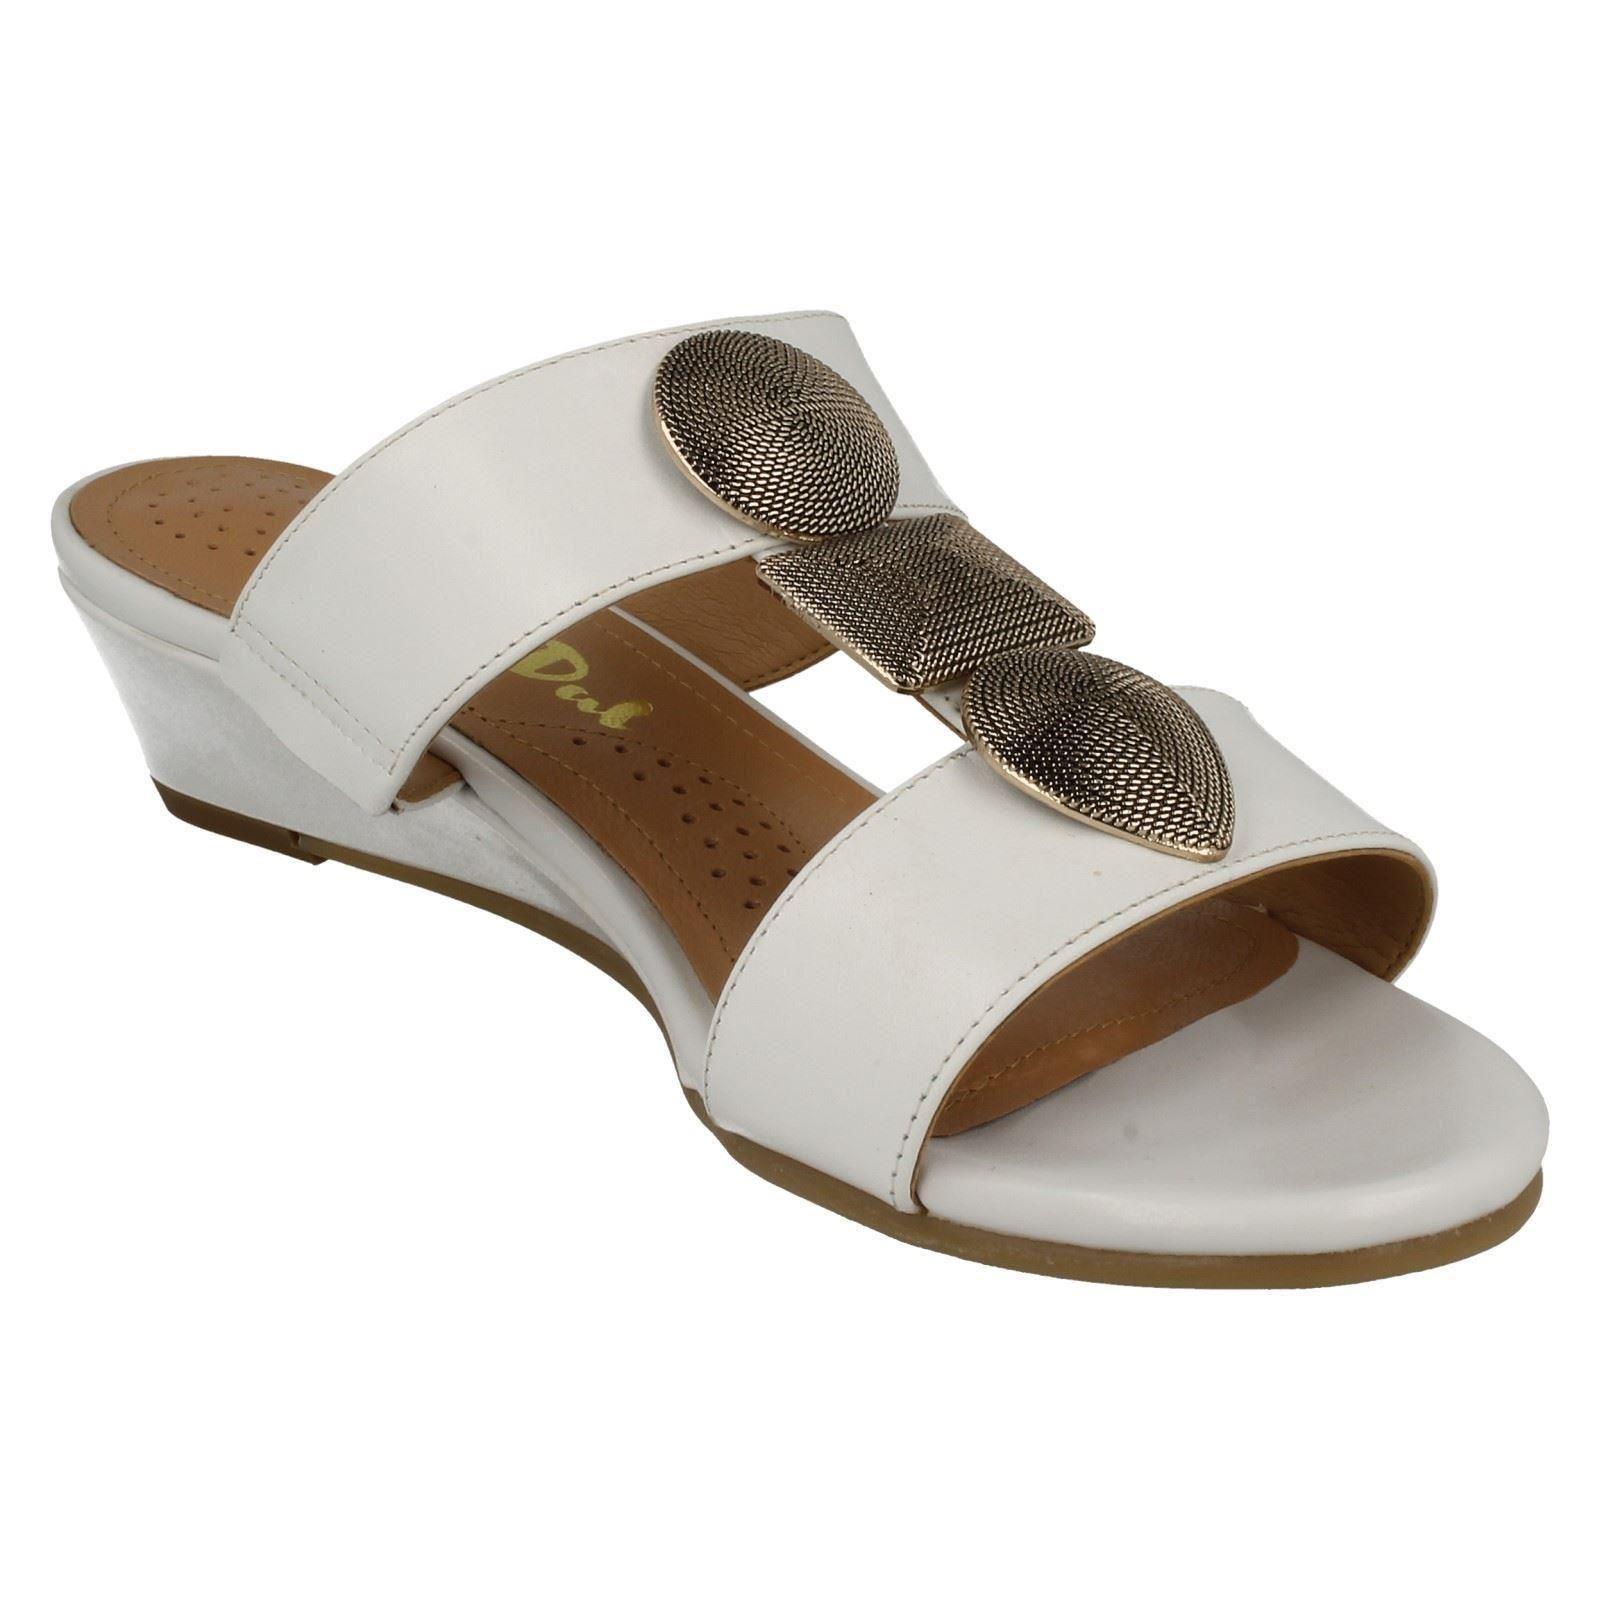 Ladies-Van-Dal-Open-Toe-Slip-On-Summer-Low-Wedge-Leather-Sandals-Epsom thumbnail 8